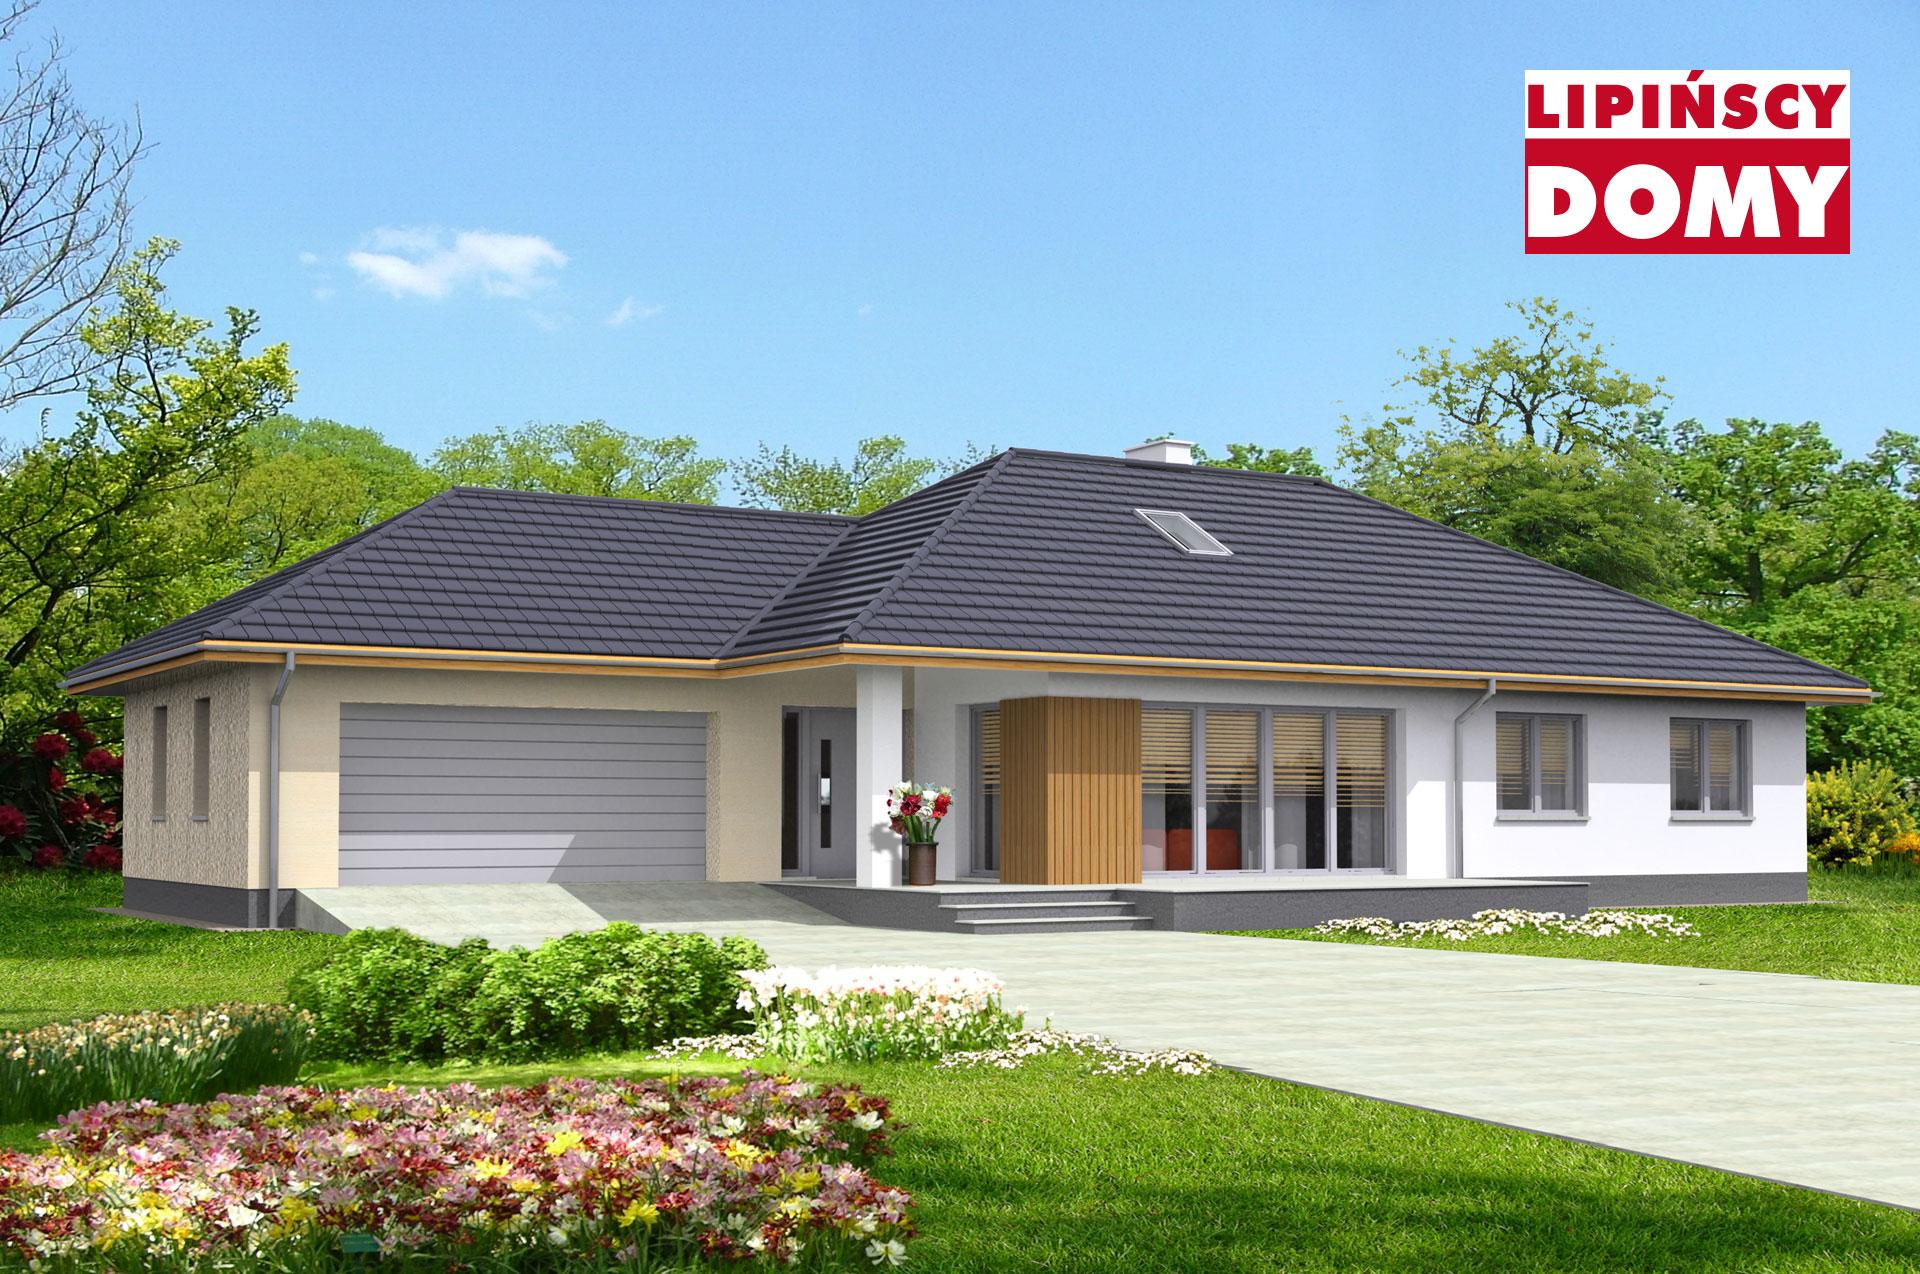 projekt domu Verona dcb124 Lipińscy Domy